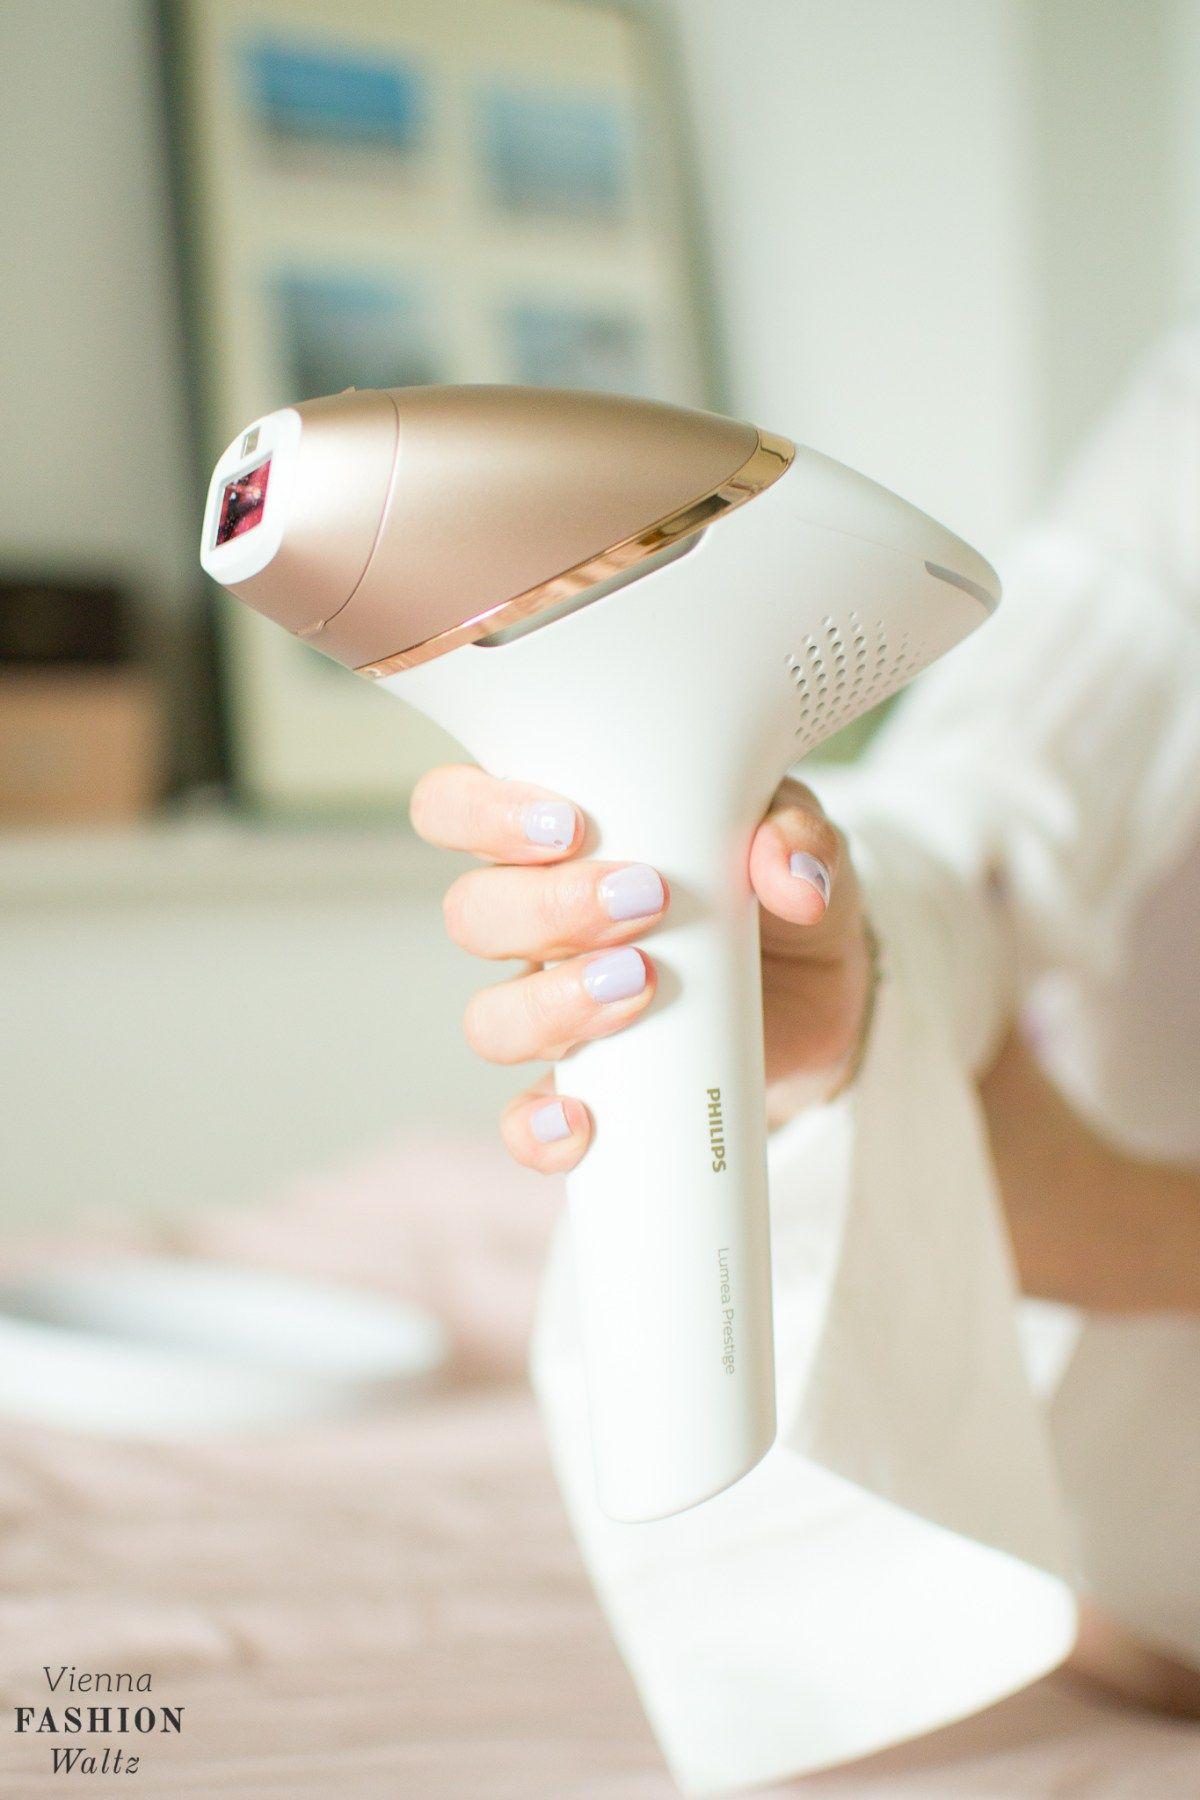 Dauerhafte Haarentfernung Mit Philips Lumea Hair Removal Devices Philips Lumea Beauty